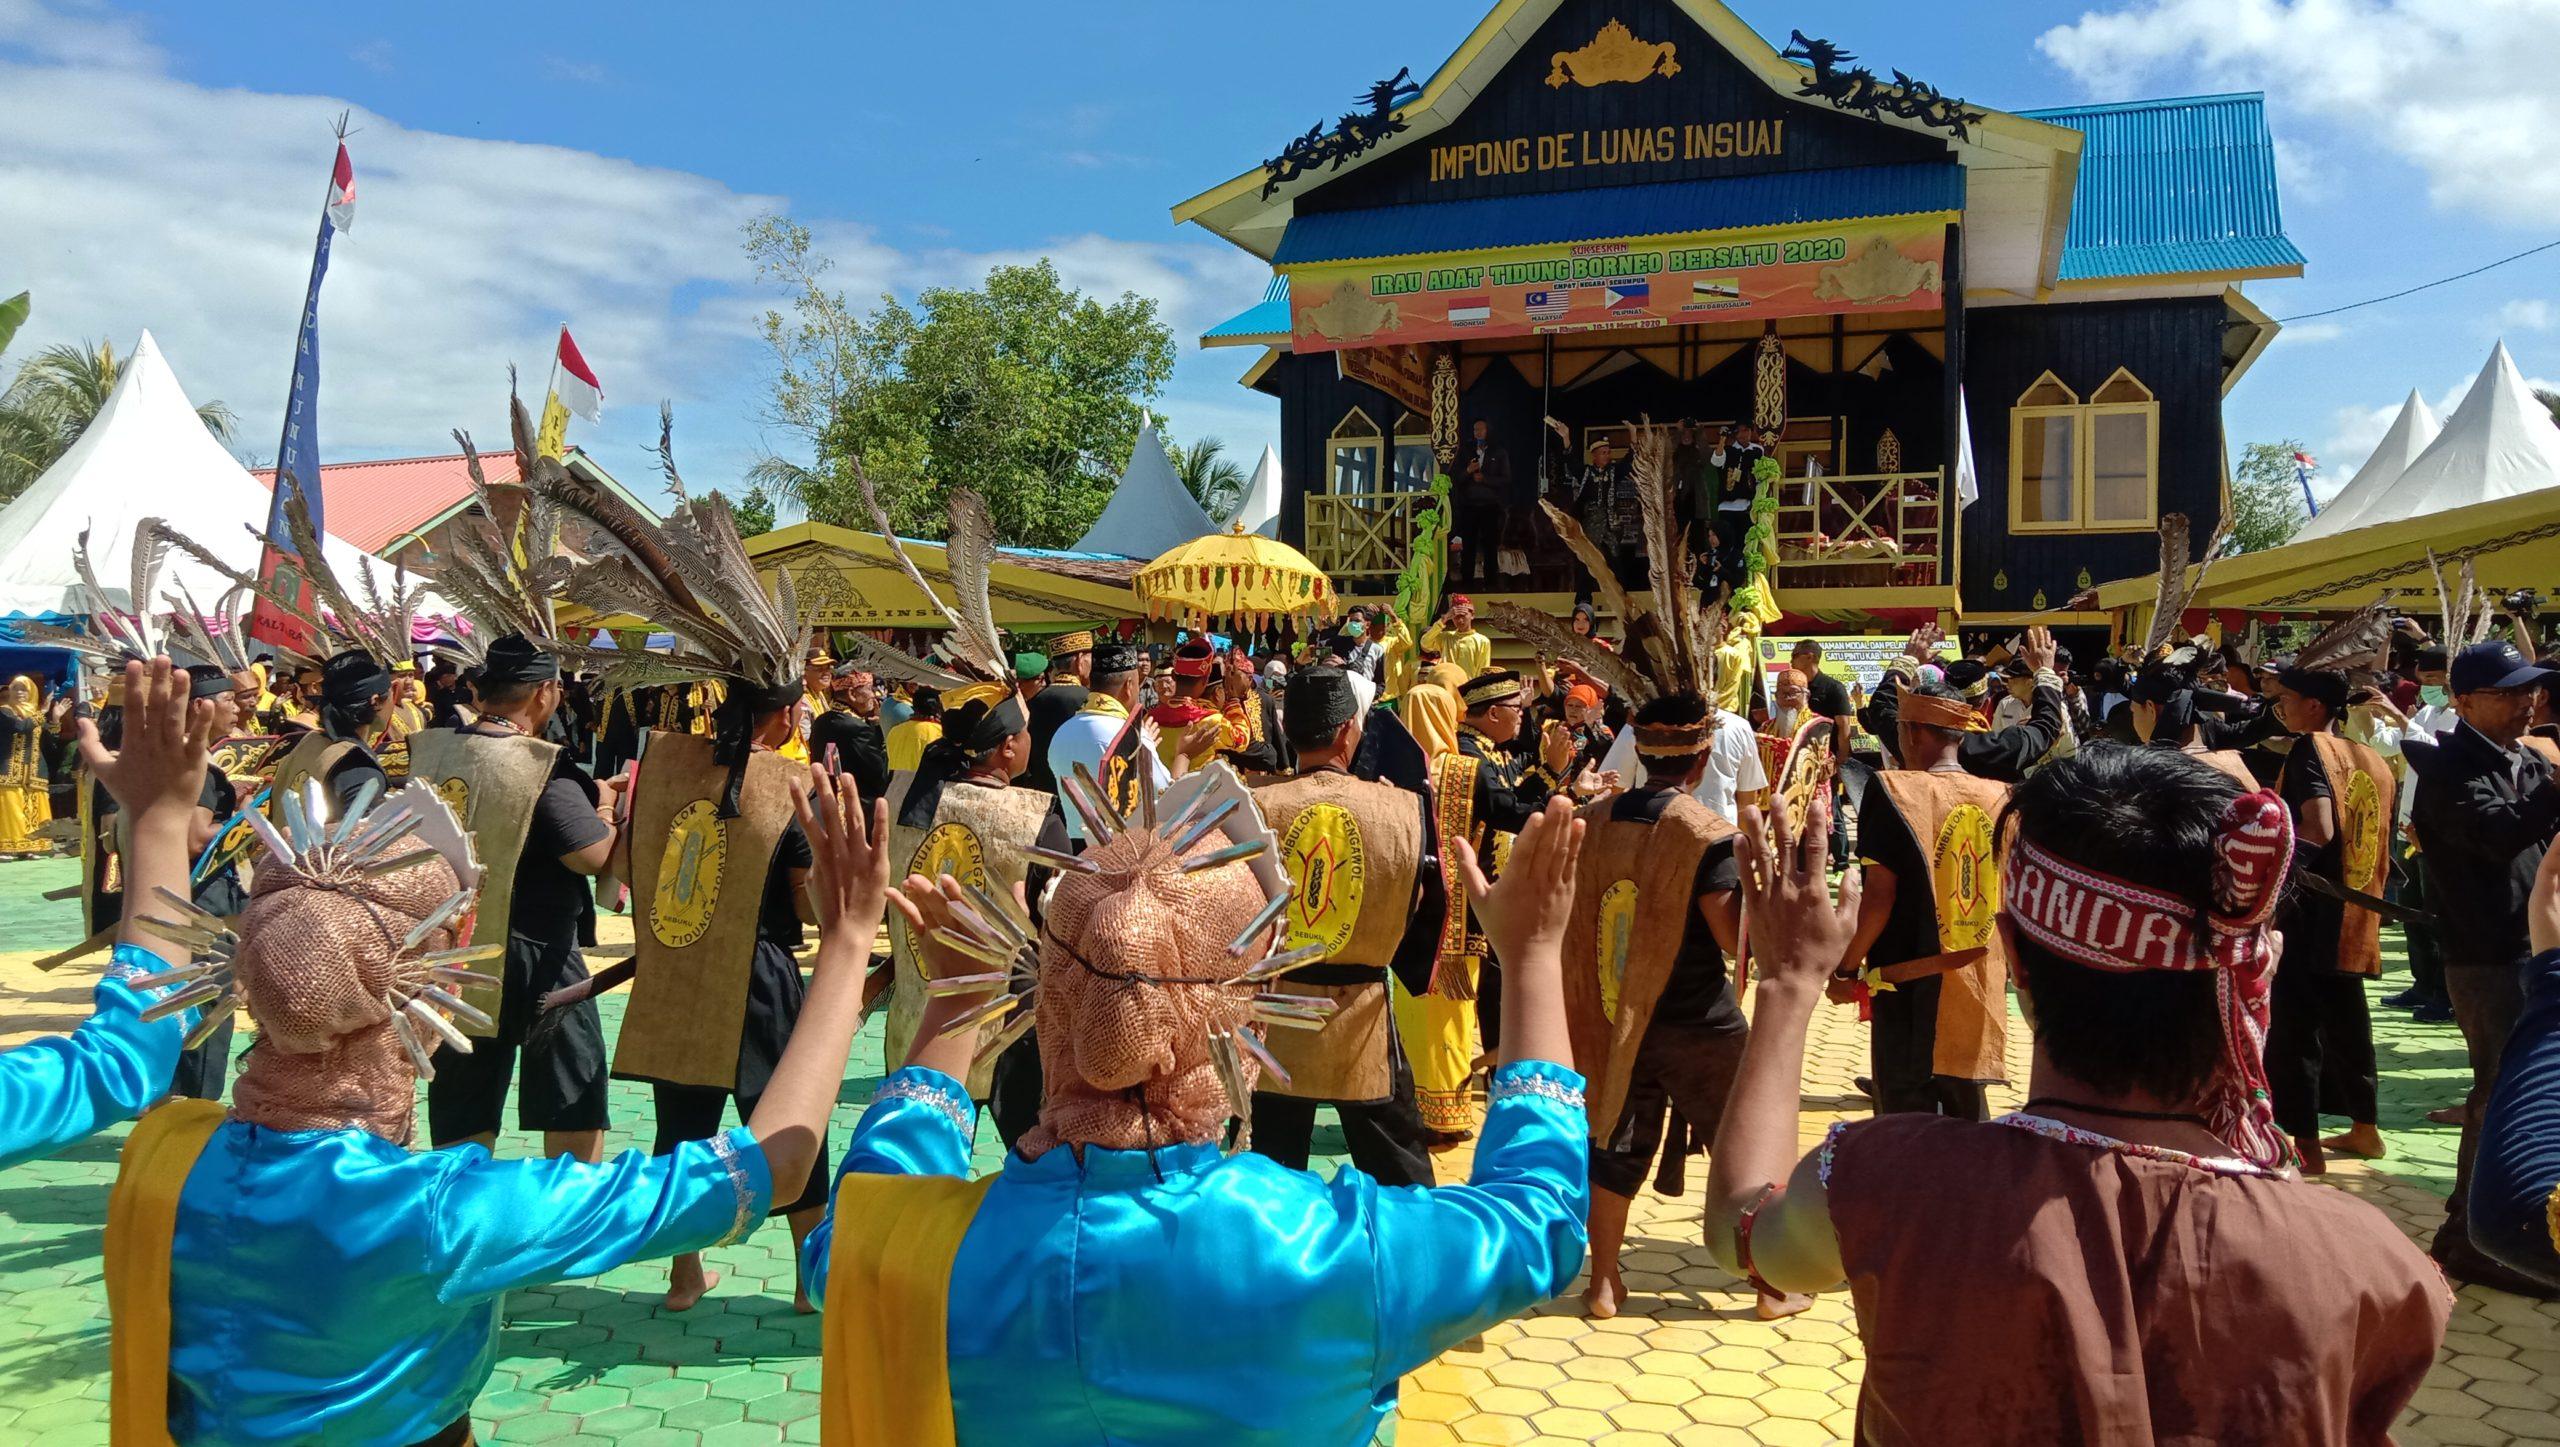 Para Pemuda dan Pemudi suku Tidung menari bersama tamu undangan dalam acara Pembukaan Iraw Borneo Bersatu 2020 di Pelataran Baloi ( Rumah Adat Tidung ) Desa Binusan, Nunukan, Kaltara, Rabu (11/3/2020).